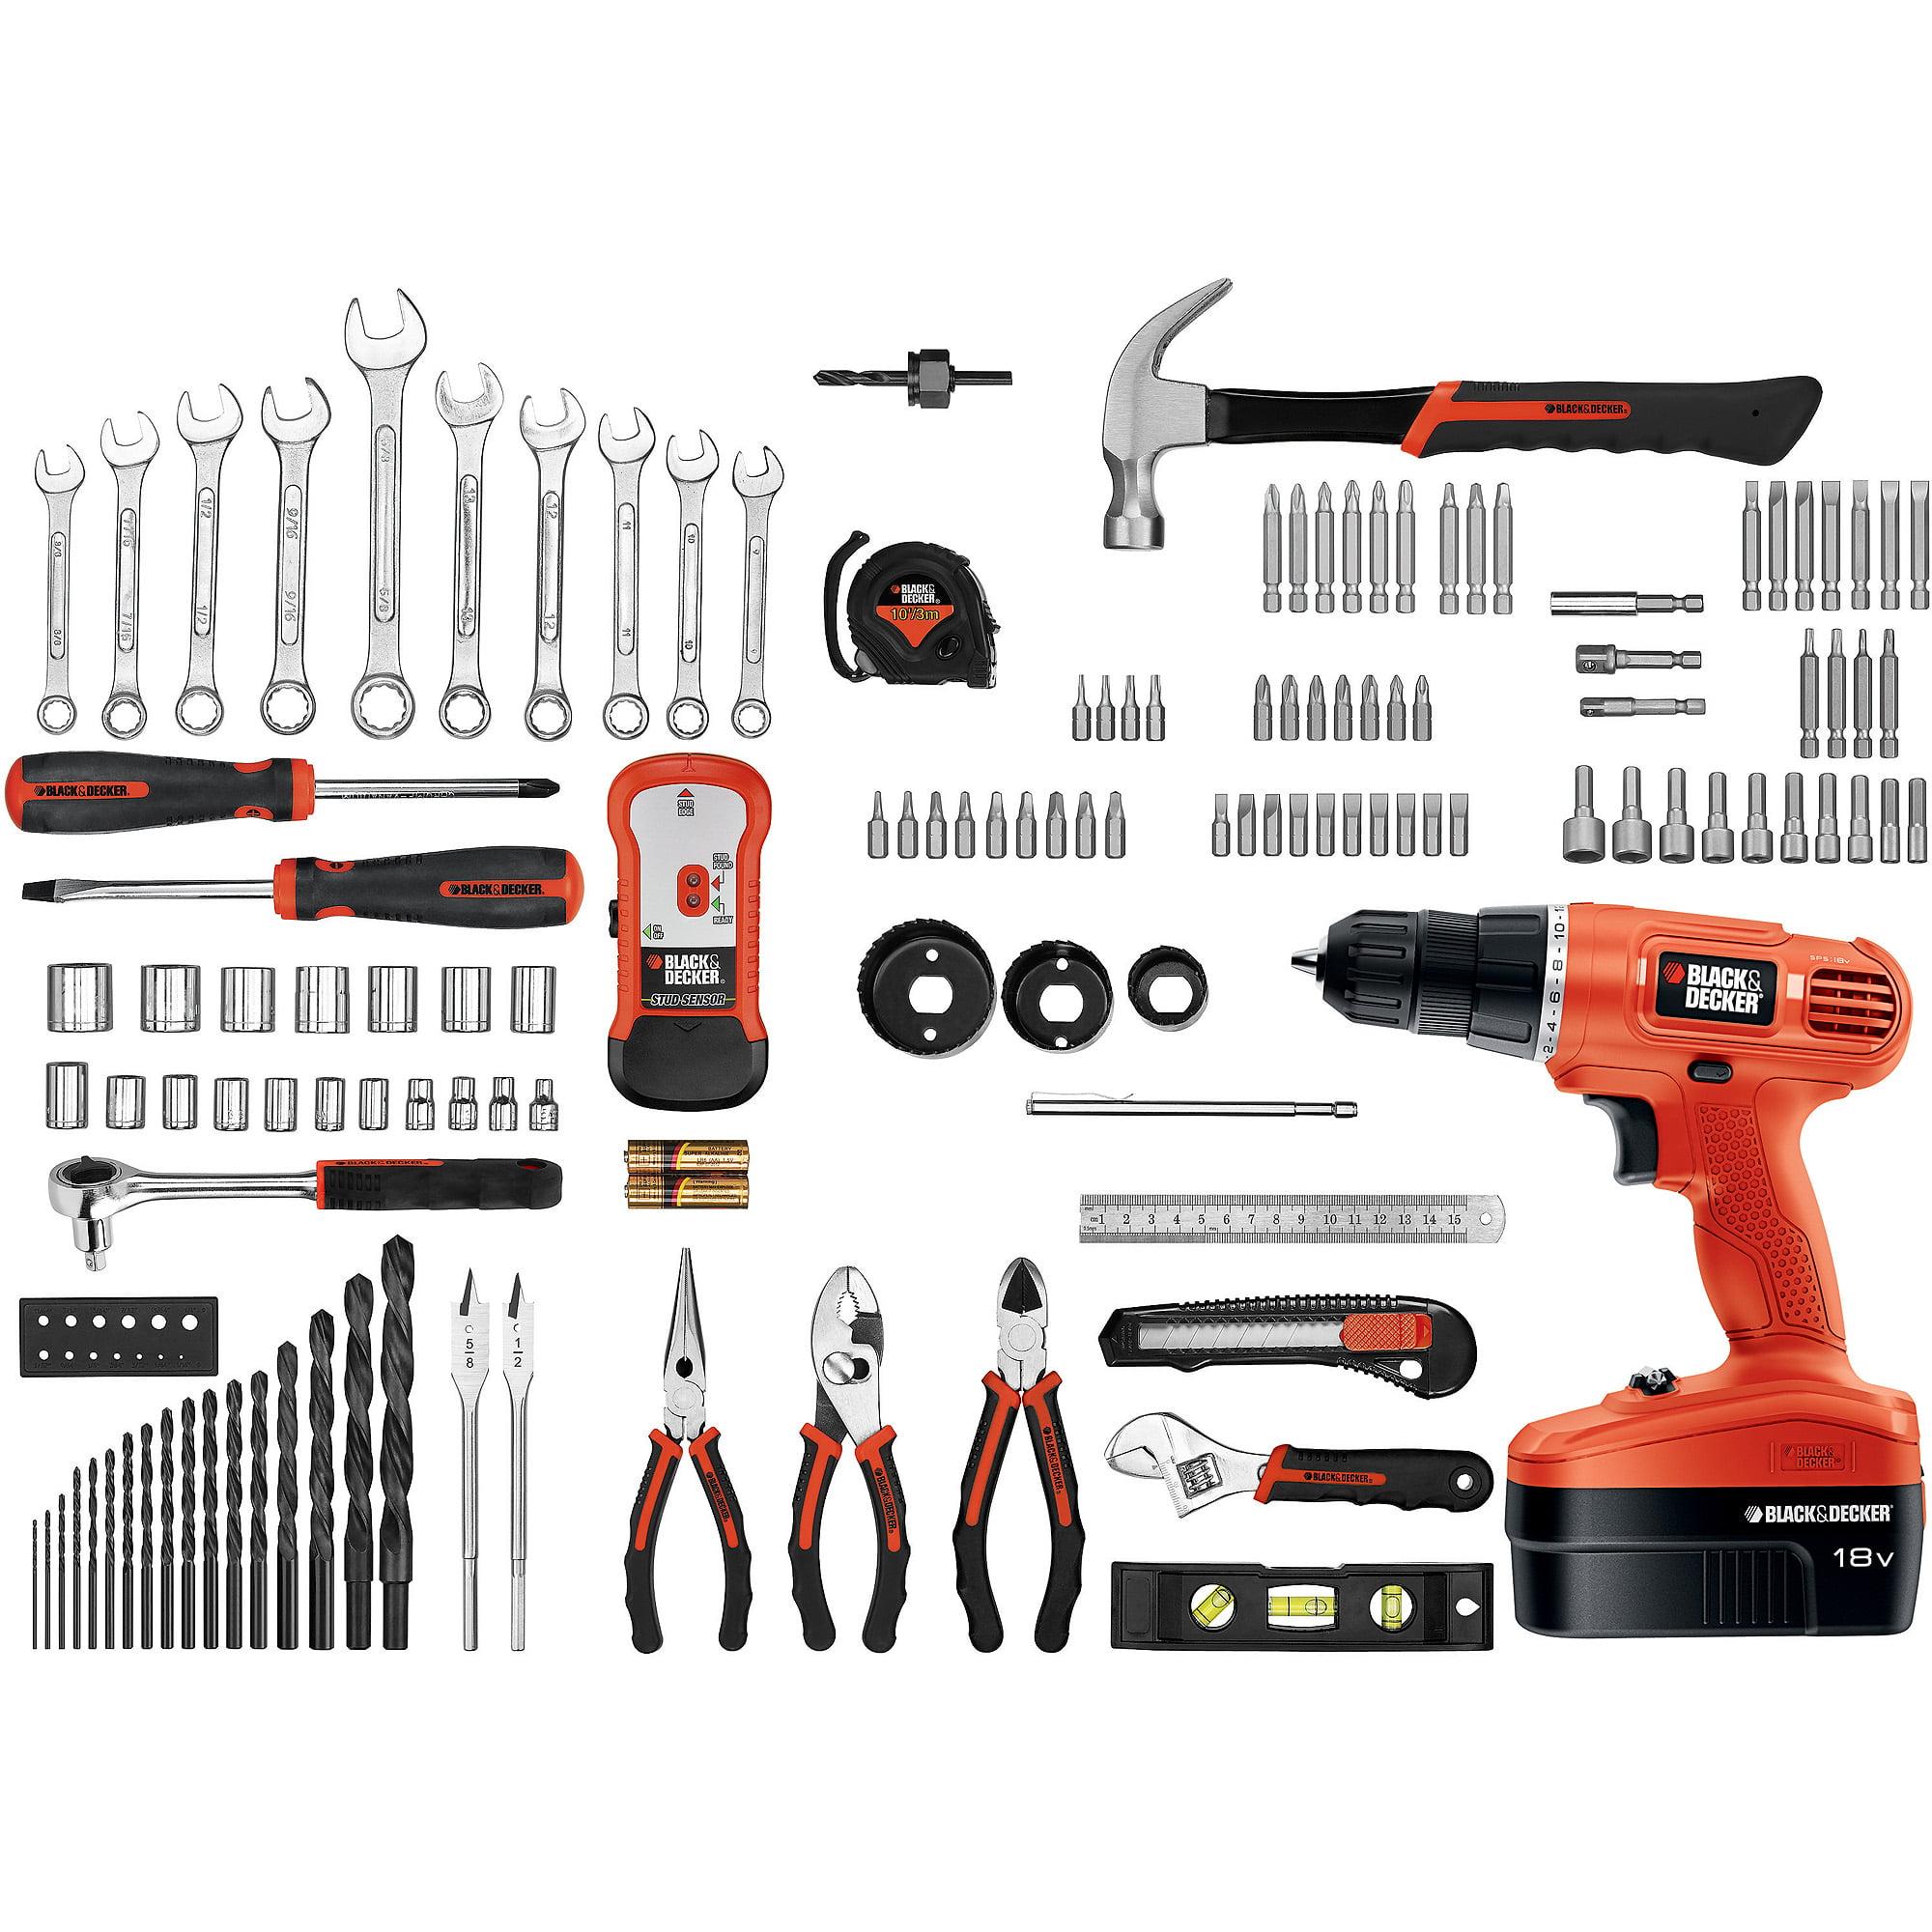 black and decker drill 20v. black \u0026 decker 18-volt nicad drill and 133 pieces home project kit - walmart.com 20v